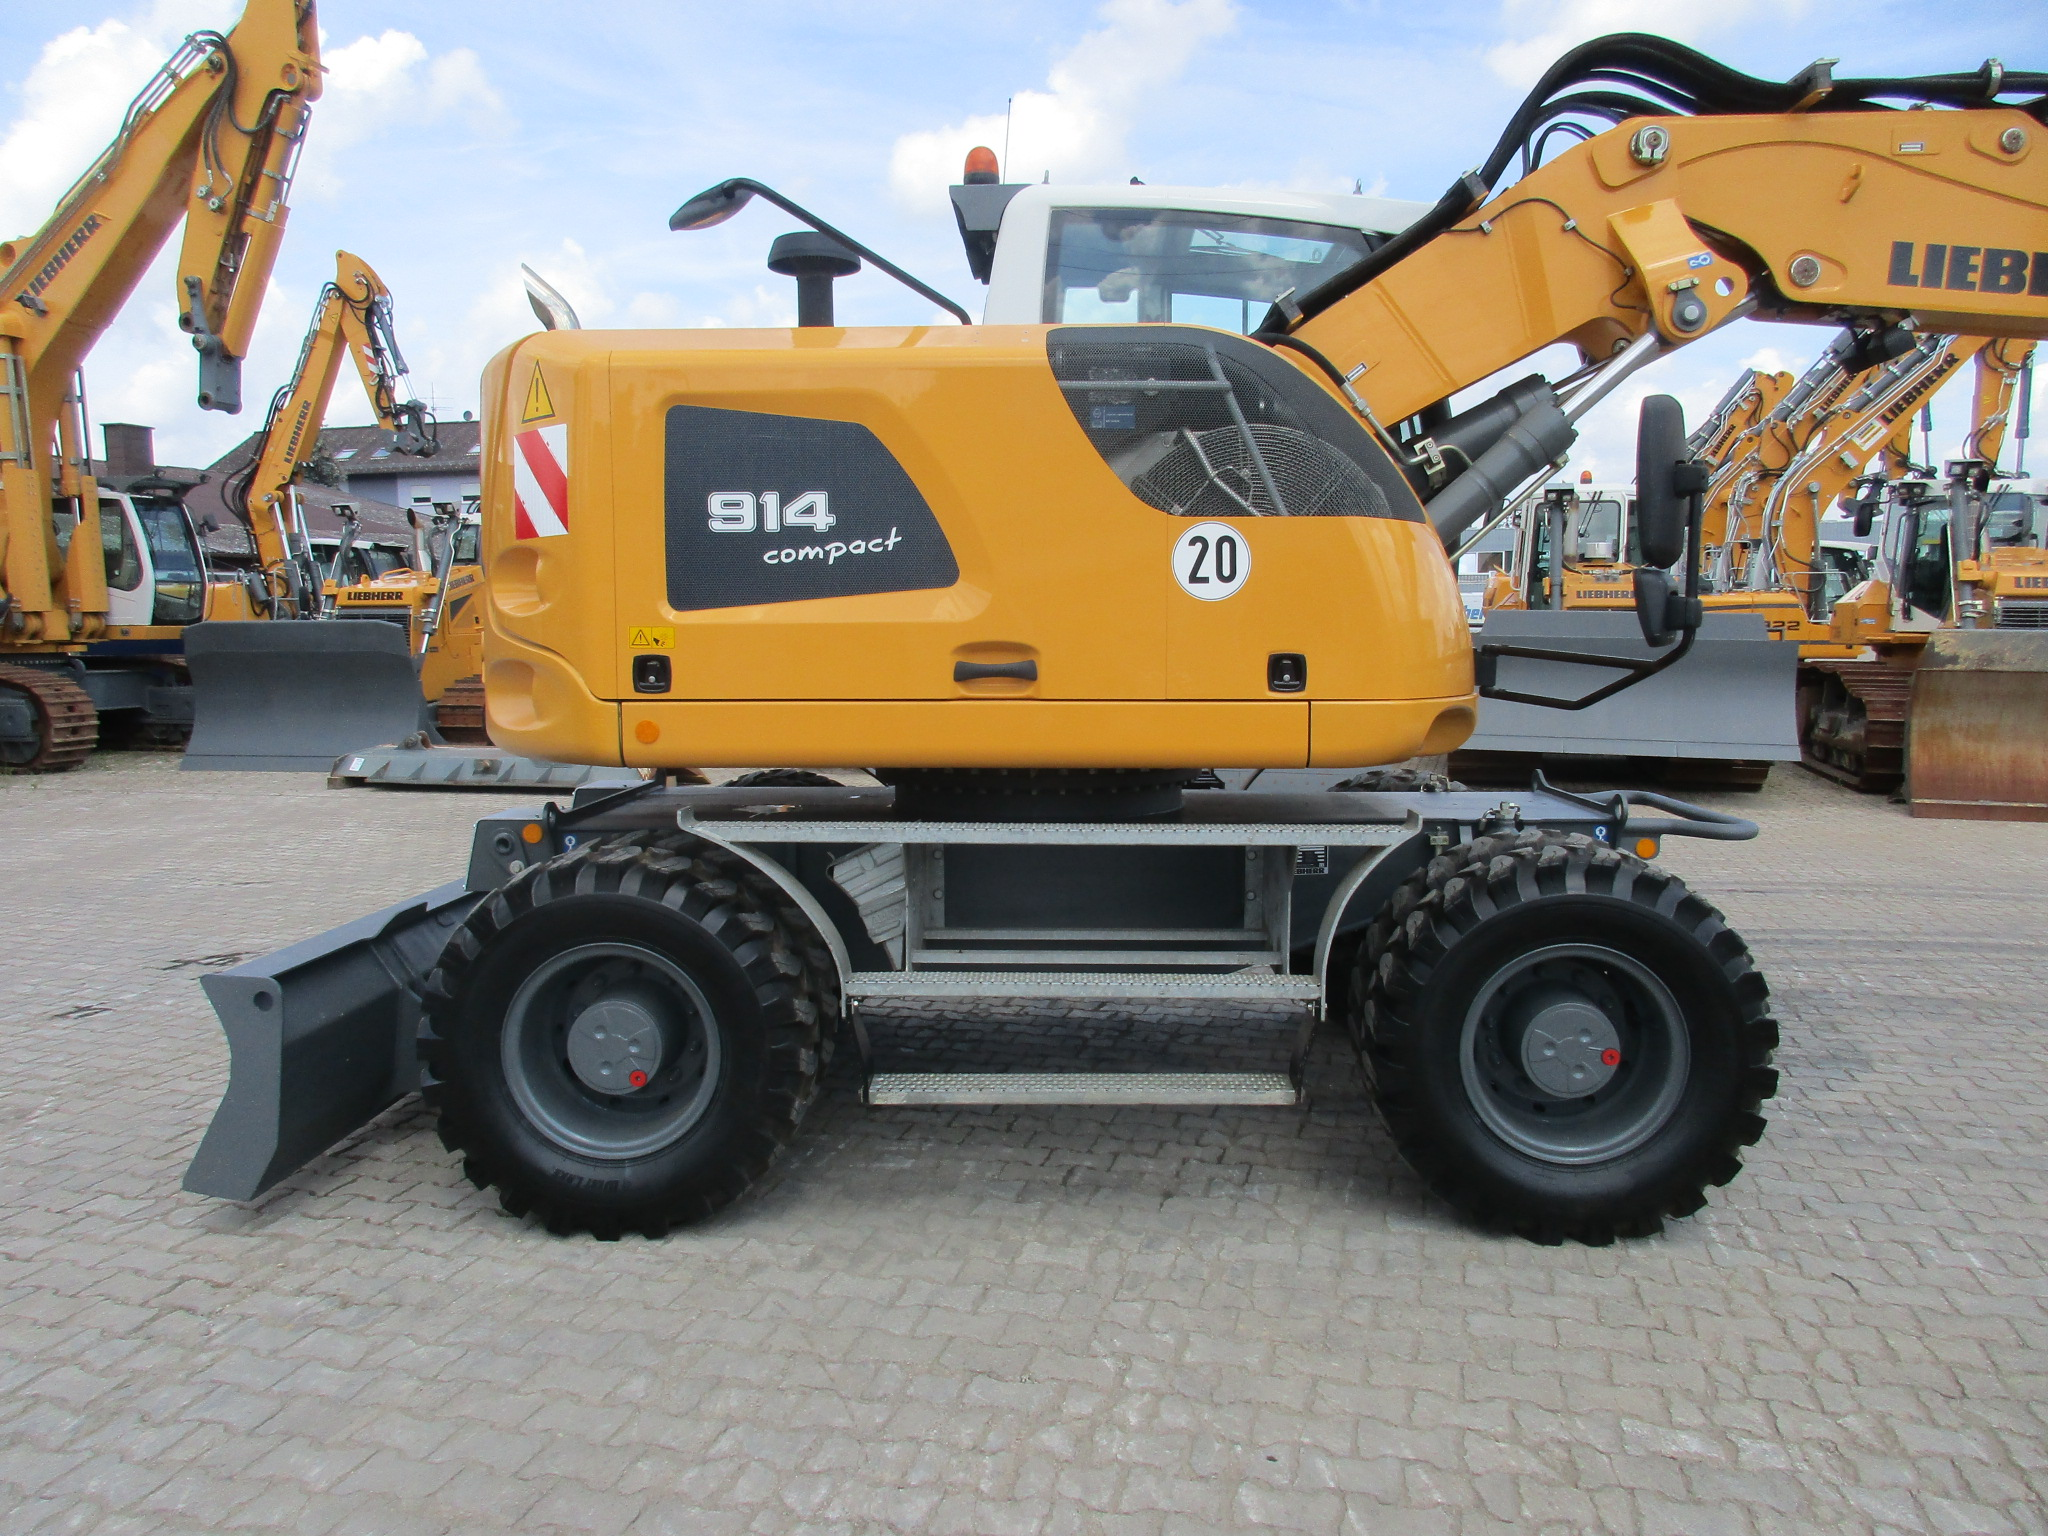 A914 Compact LI-1188-77728 - ex LMP_002.JPG